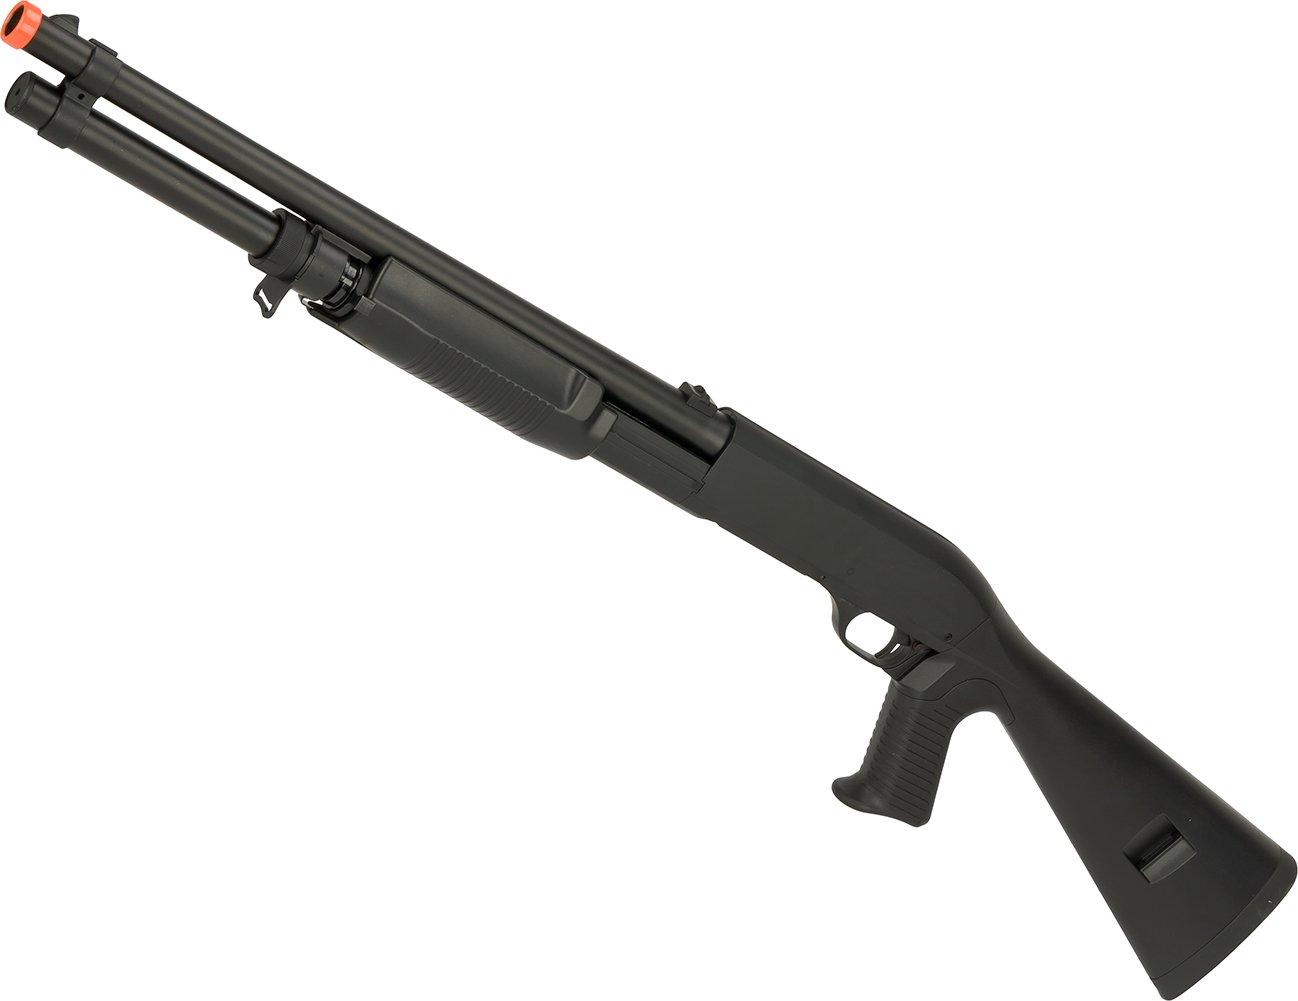 Evike - CYMA Full Metal M3 3-Round Burst Multi-Shot Shell Loading Airsoft Shotgun by Evike